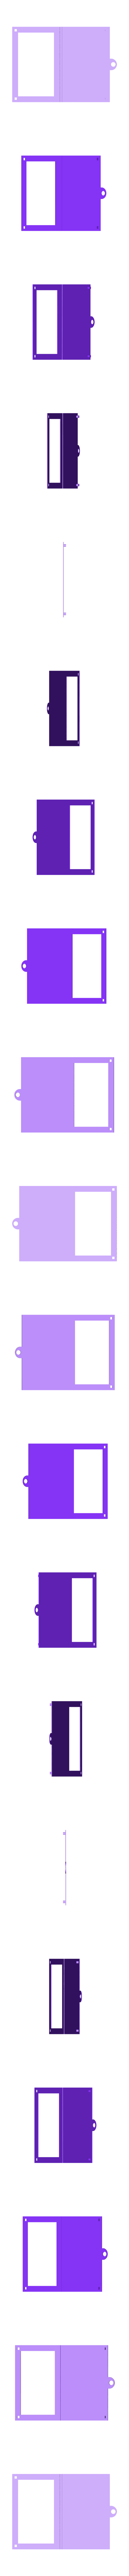 BOT_TAG.stl Download free STL file MakerBot Replicator2 Tag • 3D printing template, Bolrod